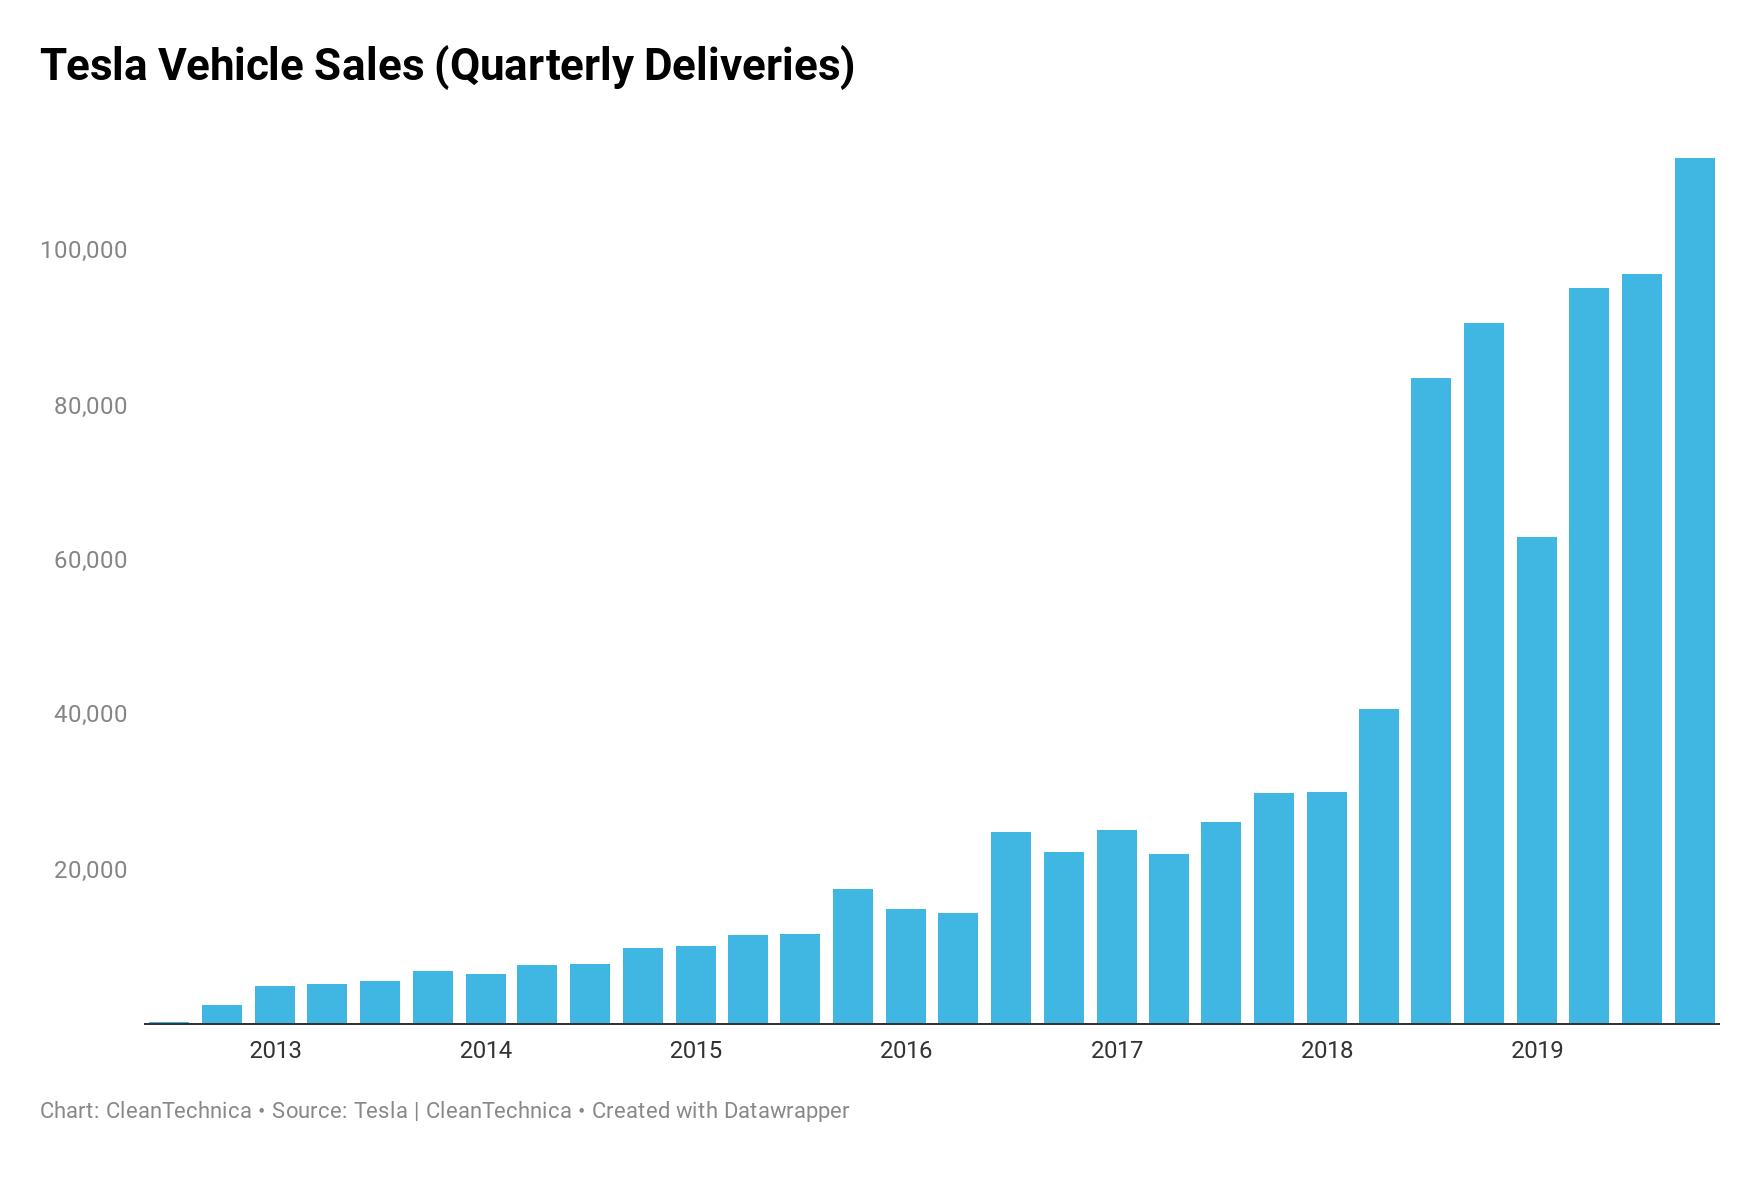 Tesla Vehicle Sales (Quarterly Deliveries)